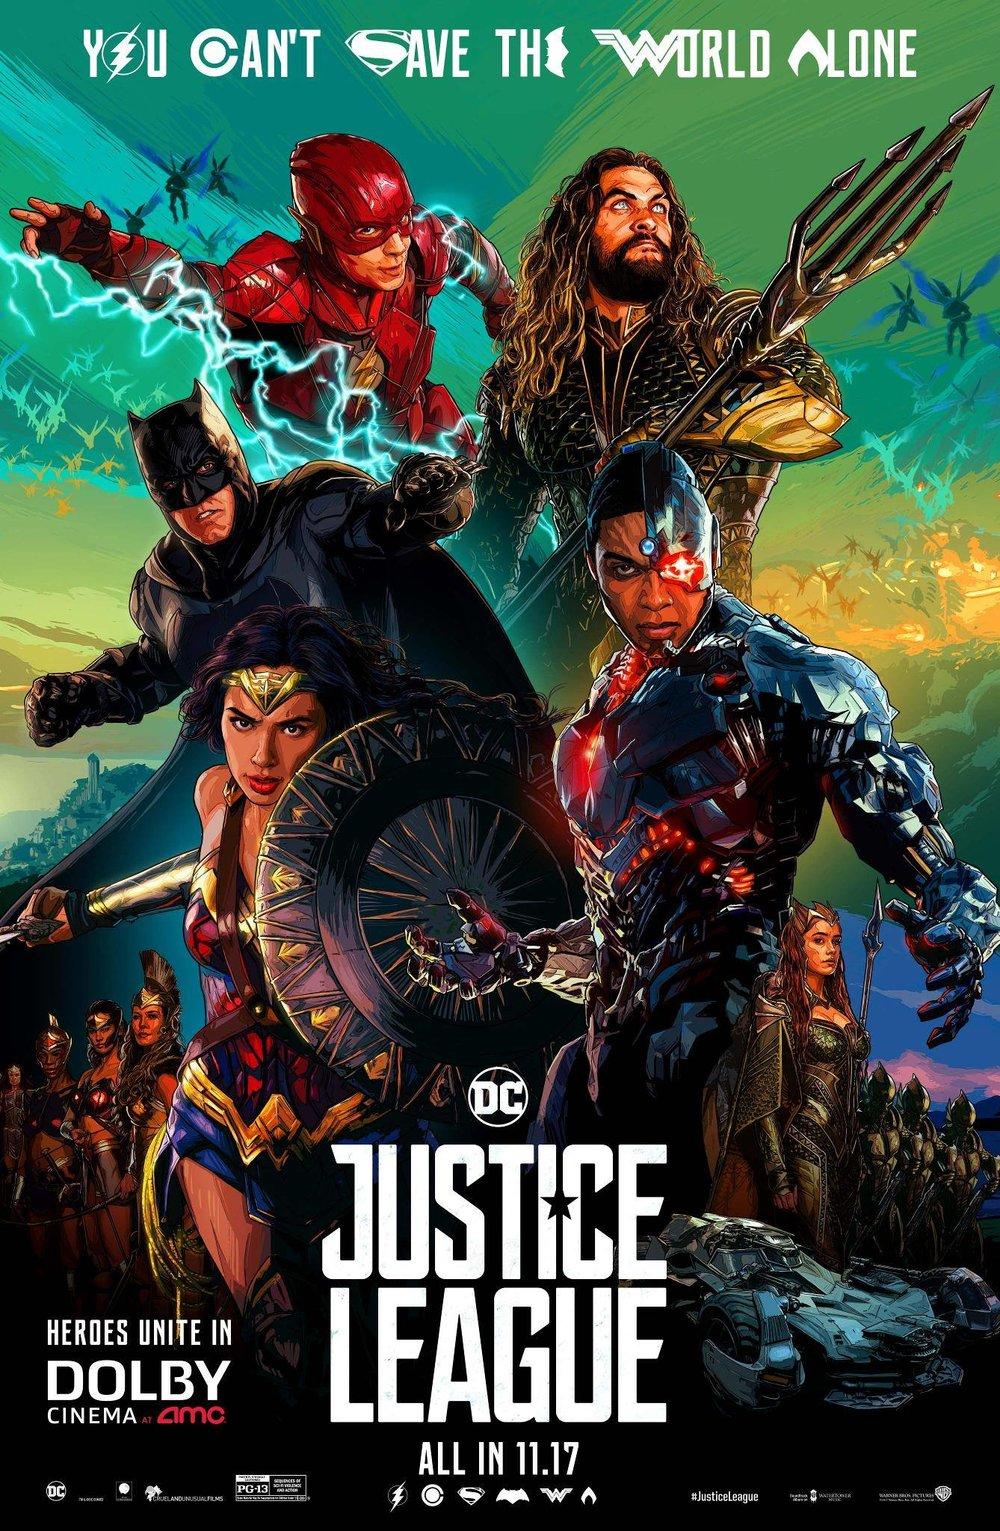 Justice-League-2017-Poster-justice-league-movie-40789722-1338-2048.jpg